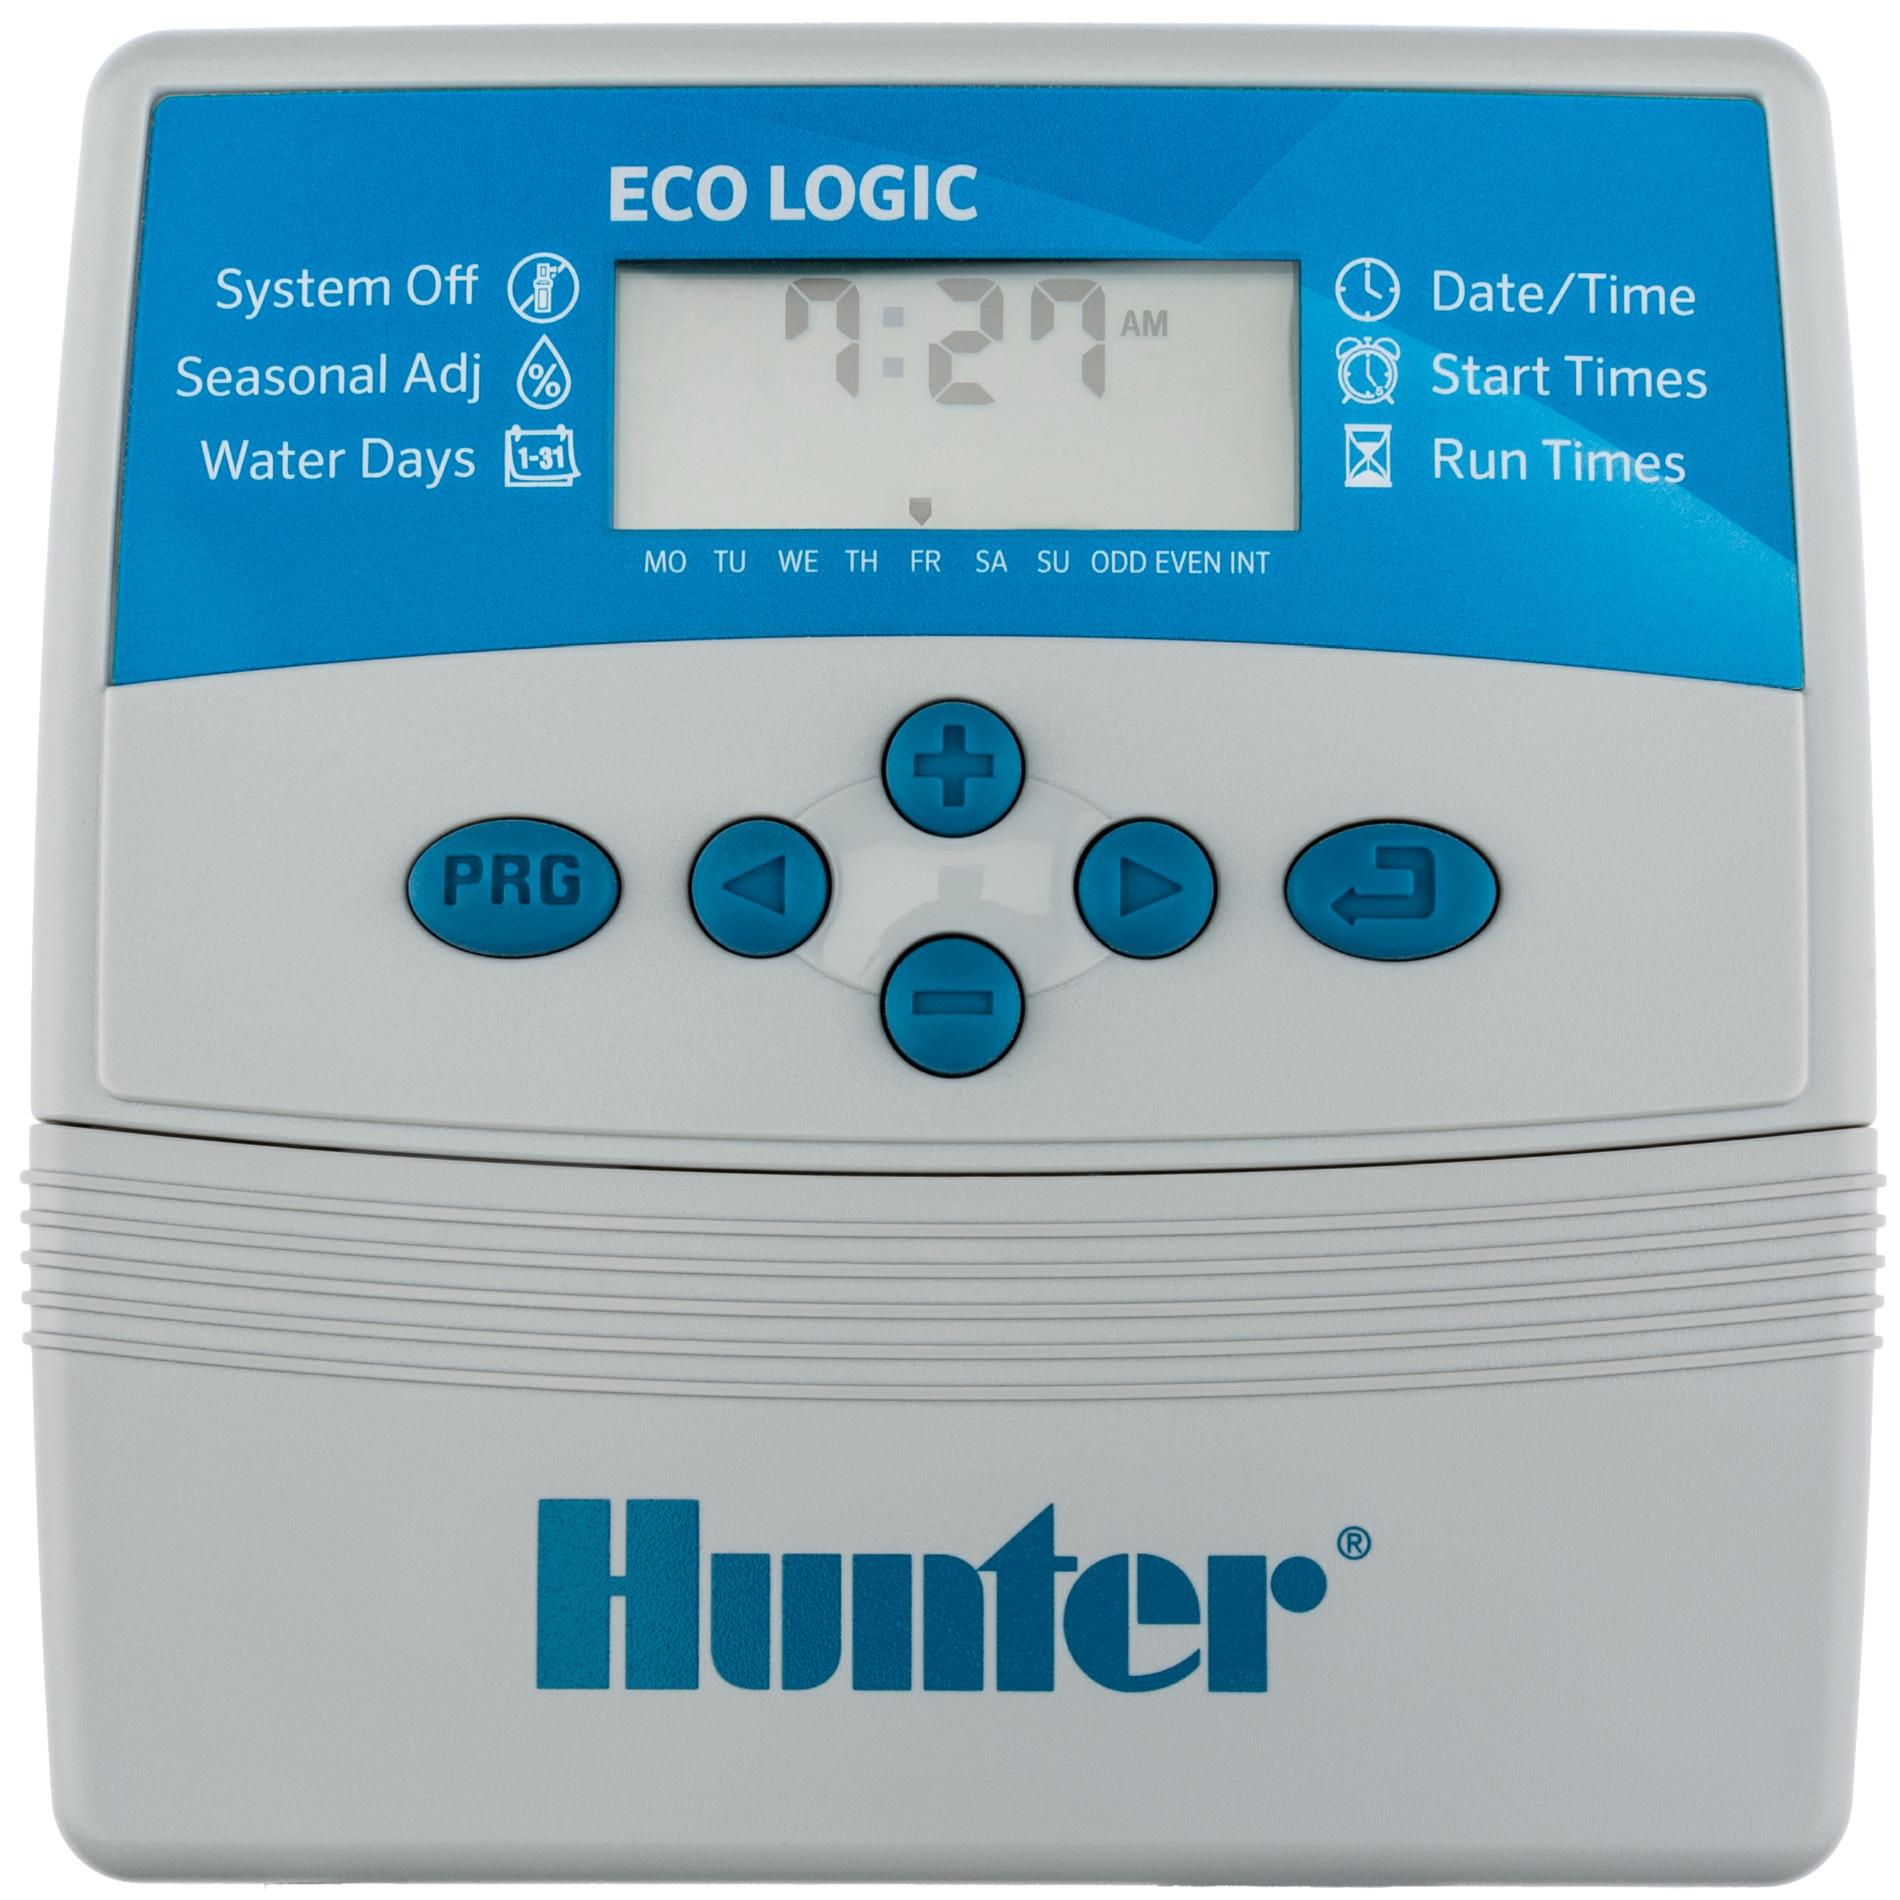 Hunter ECO LOGIC Indoor irrigation controller